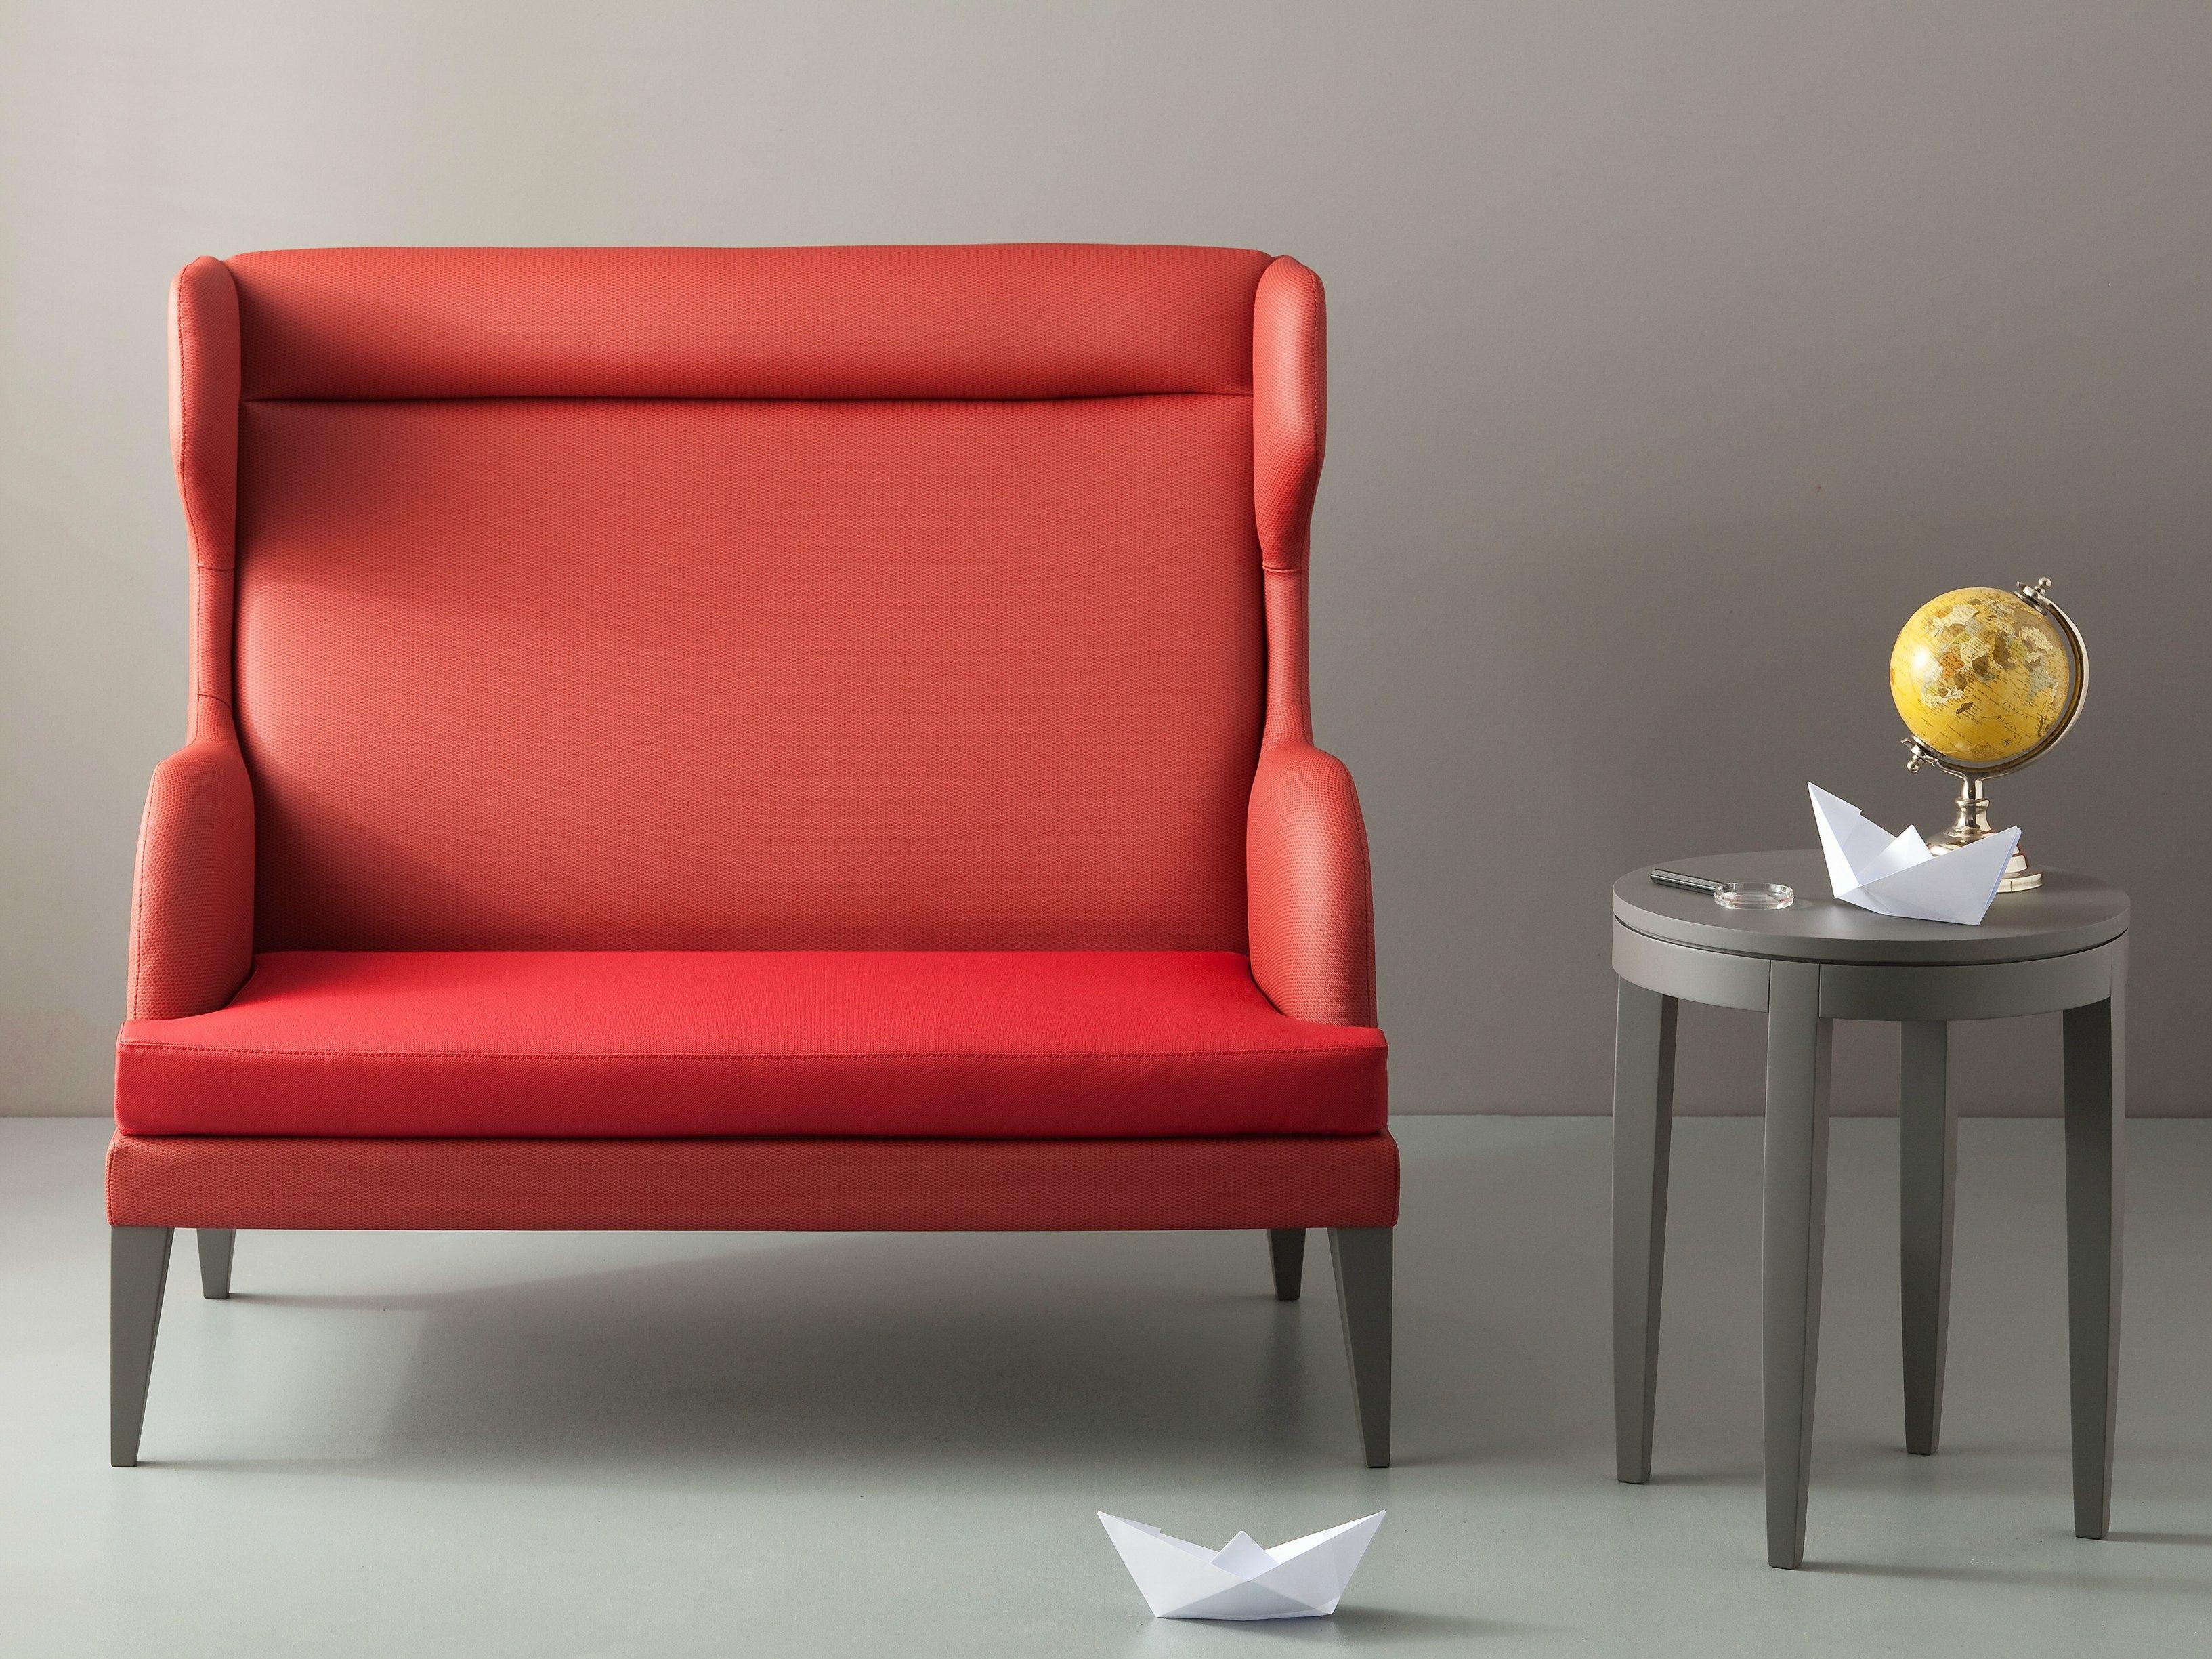 er sofa mit hoher r ckenlehne onda sofa very wood. Black Bedroom Furniture Sets. Home Design Ideas